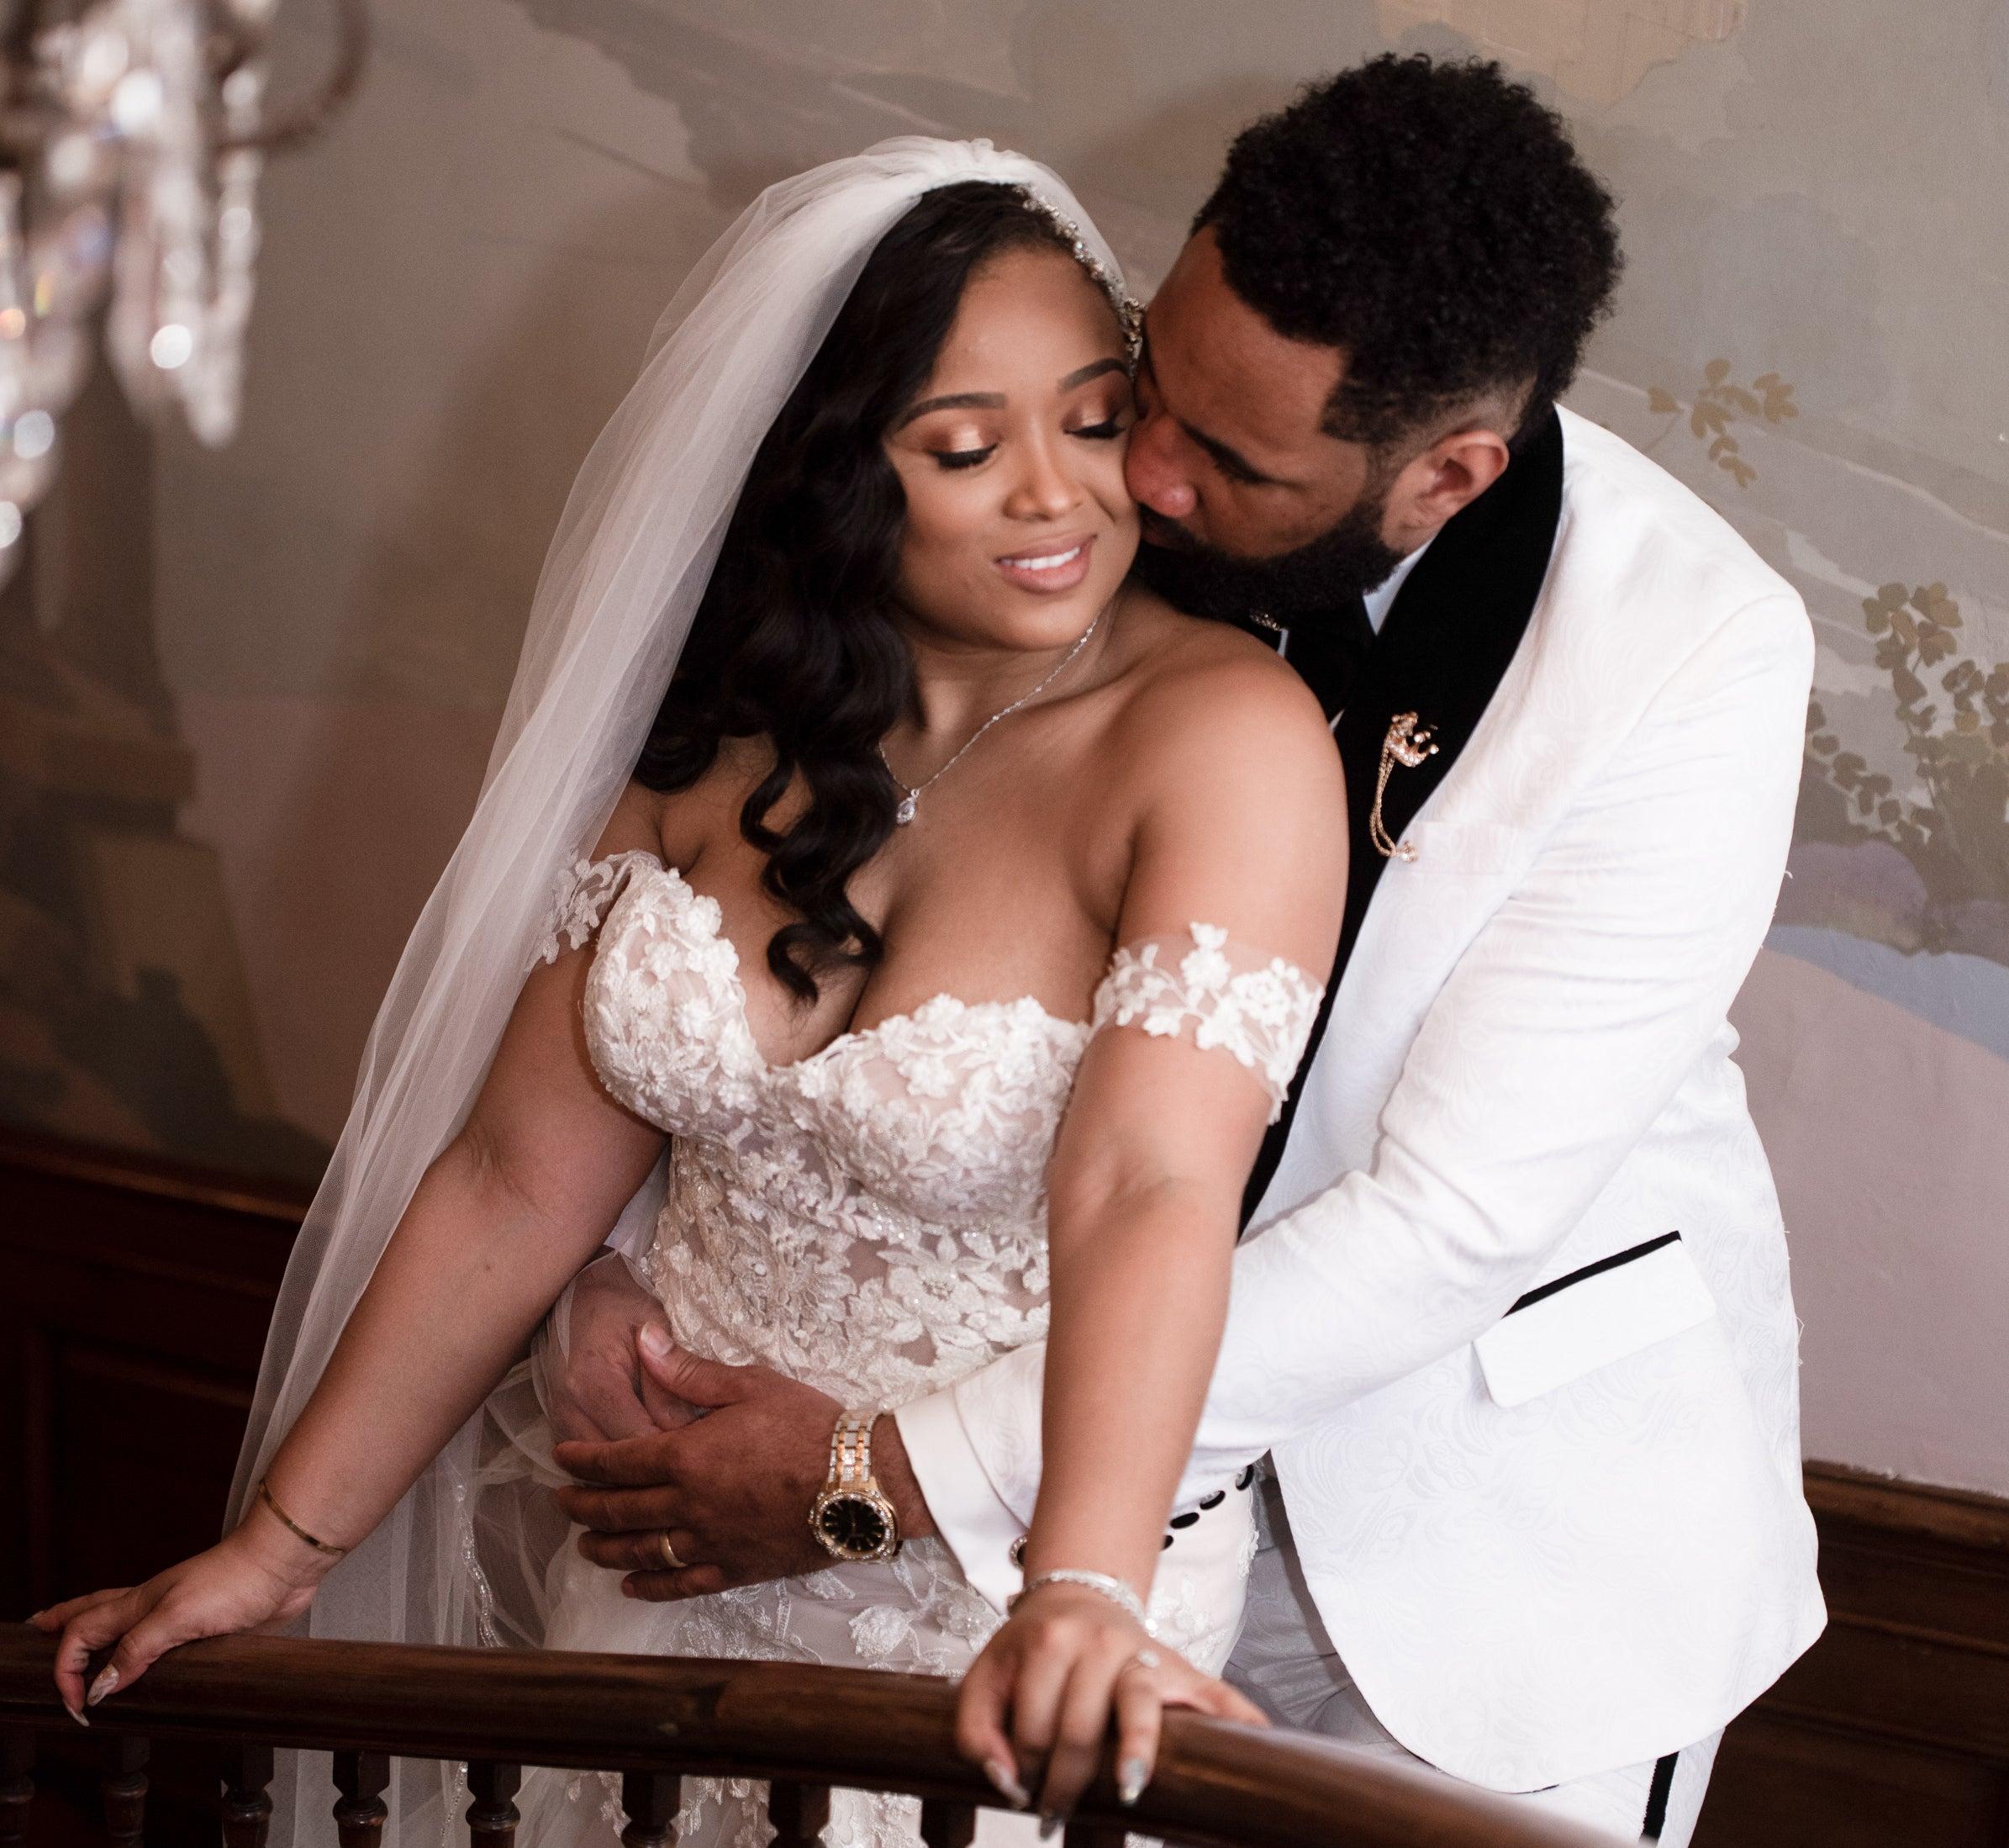 Bridal Bliss: Joscelyn And Josue's Winter Wedding In Atlanta Was Oh So Glamorous